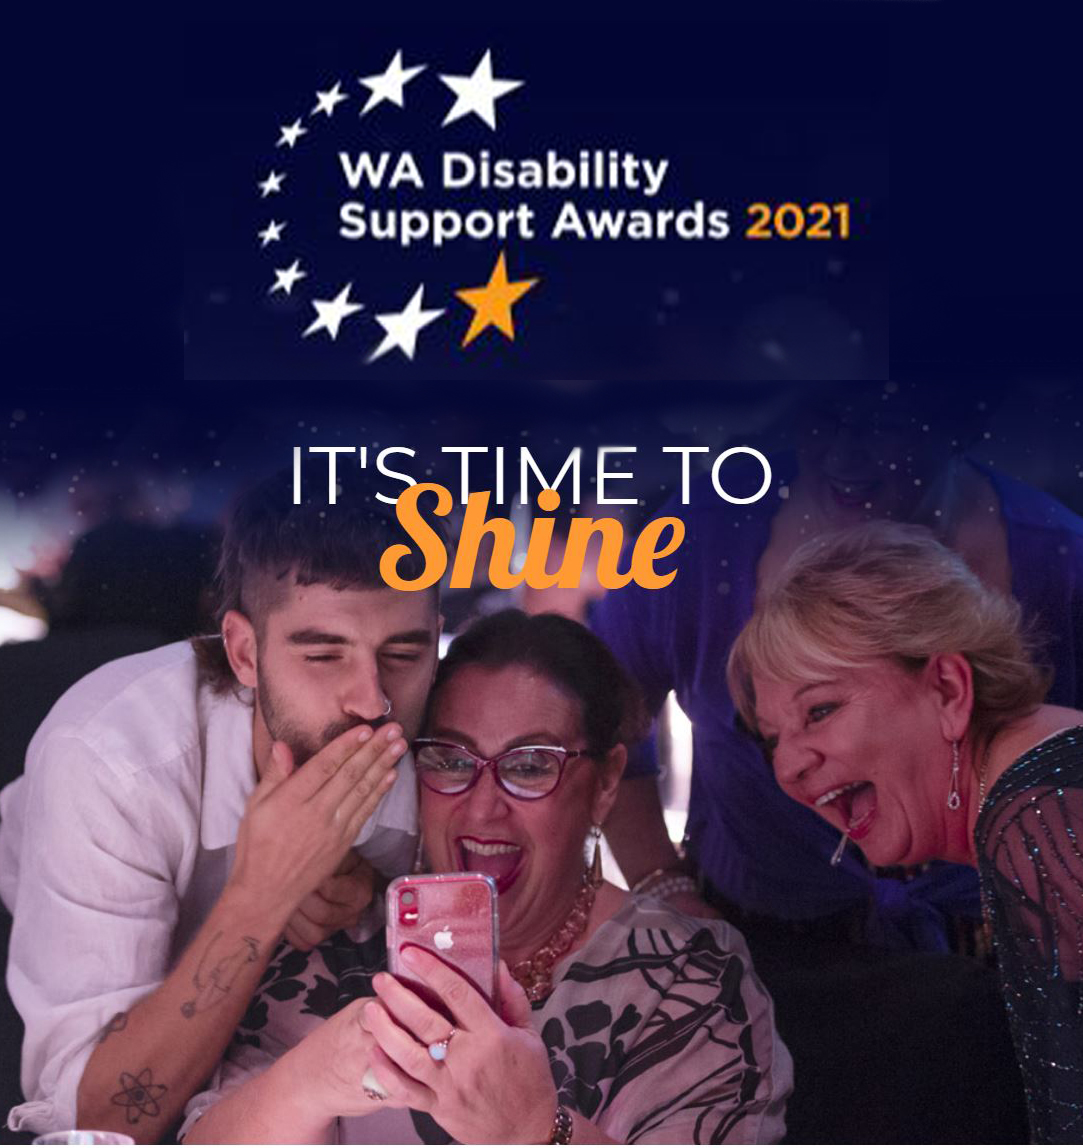 WA Disability Support Awards